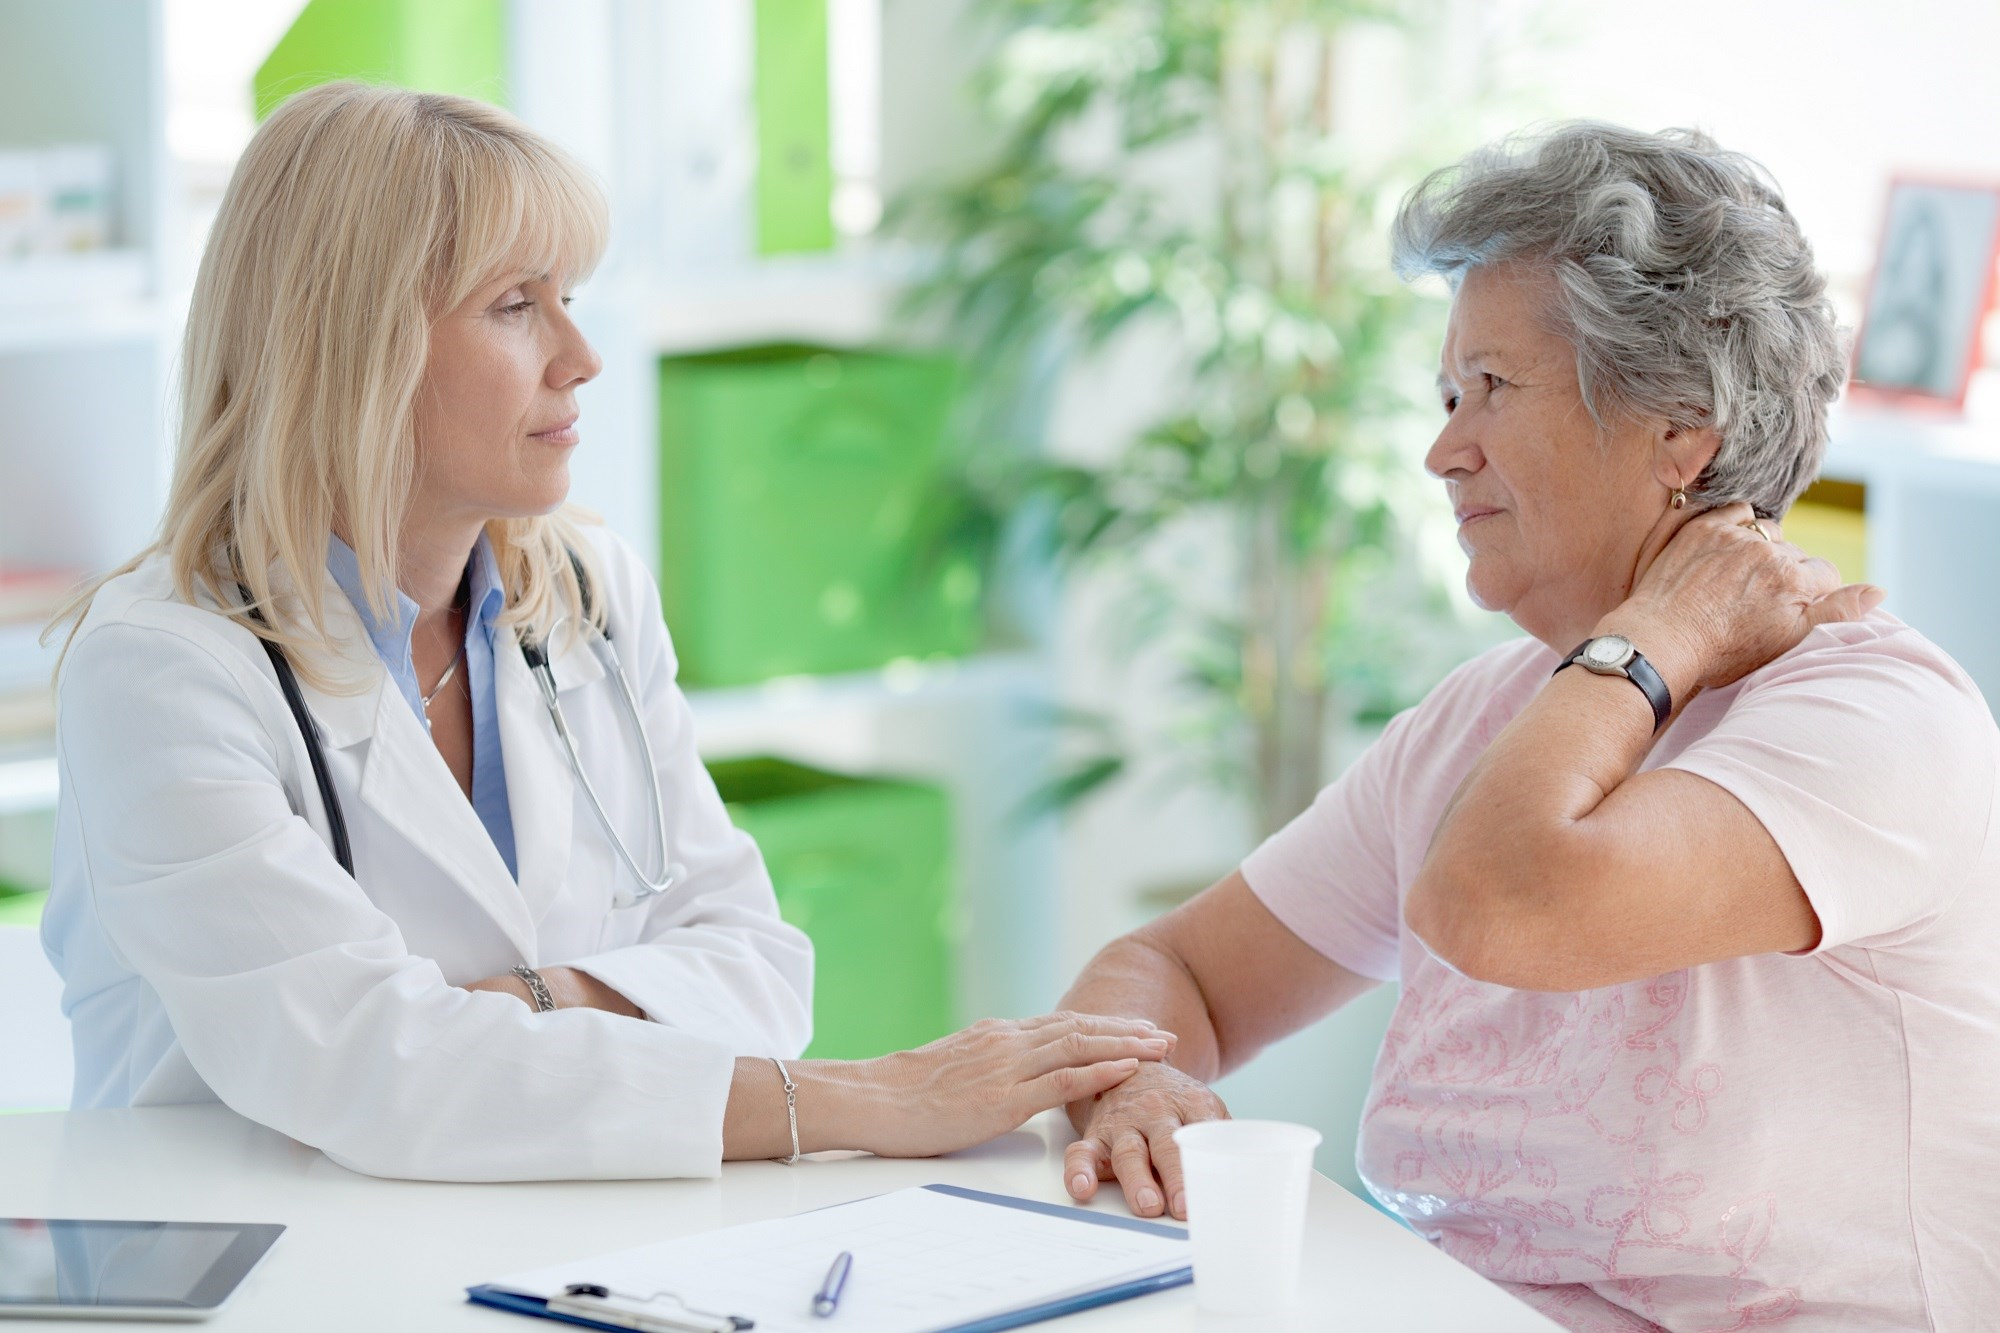 DAS28 Patient-Reported Components Identify Fibromyalgia in Rheumatoid Arthritis